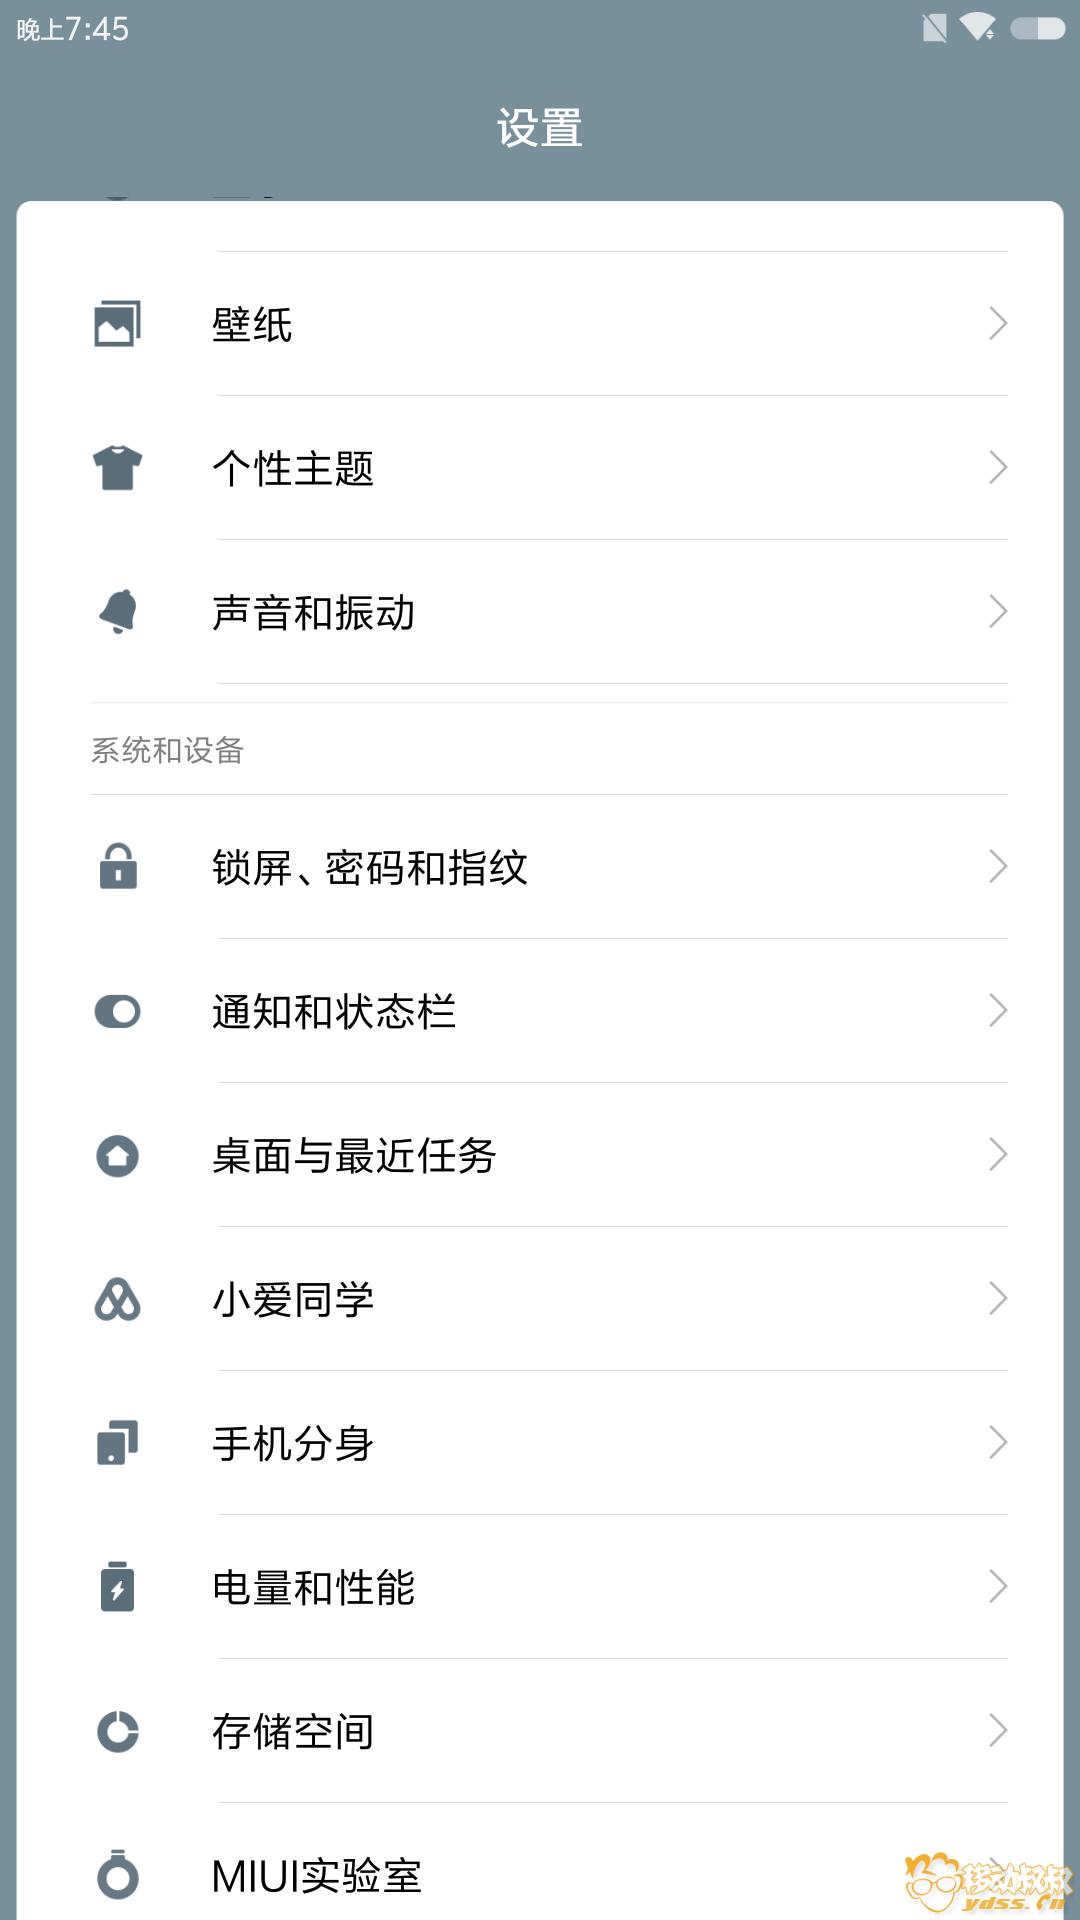 Screenshot_2018-08-04-19-45-54-439_com.android.settings.png